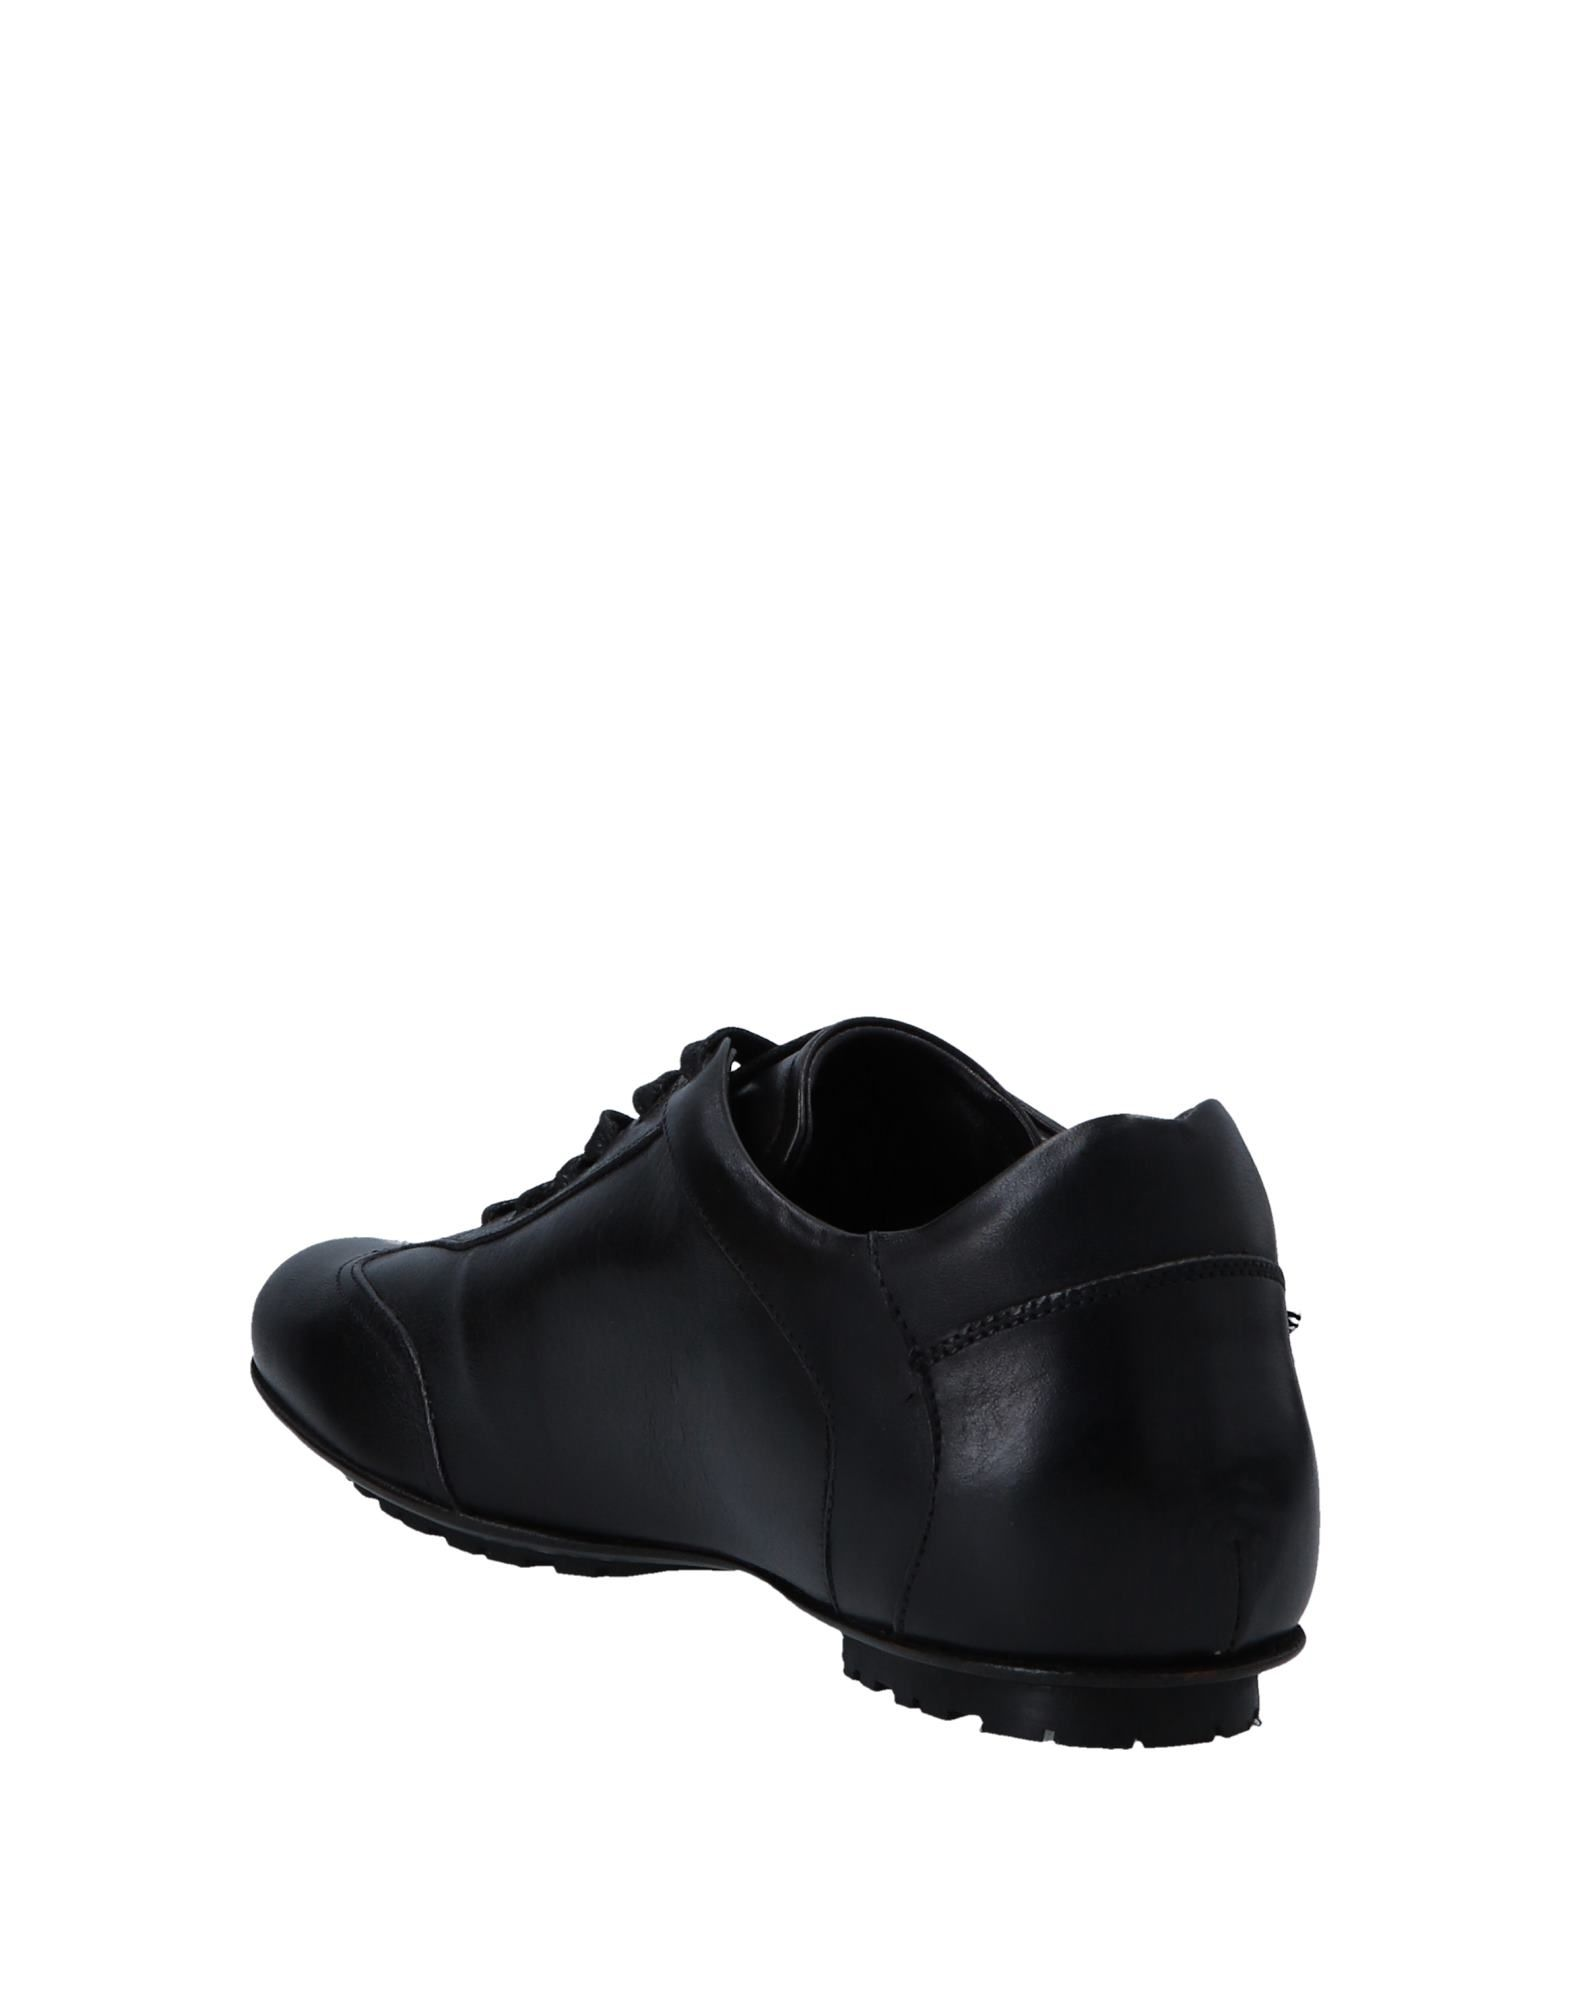 Baldinini Sneakers - Men Baldinini Sneakers online on    Canada - 11552502XG 3da25b